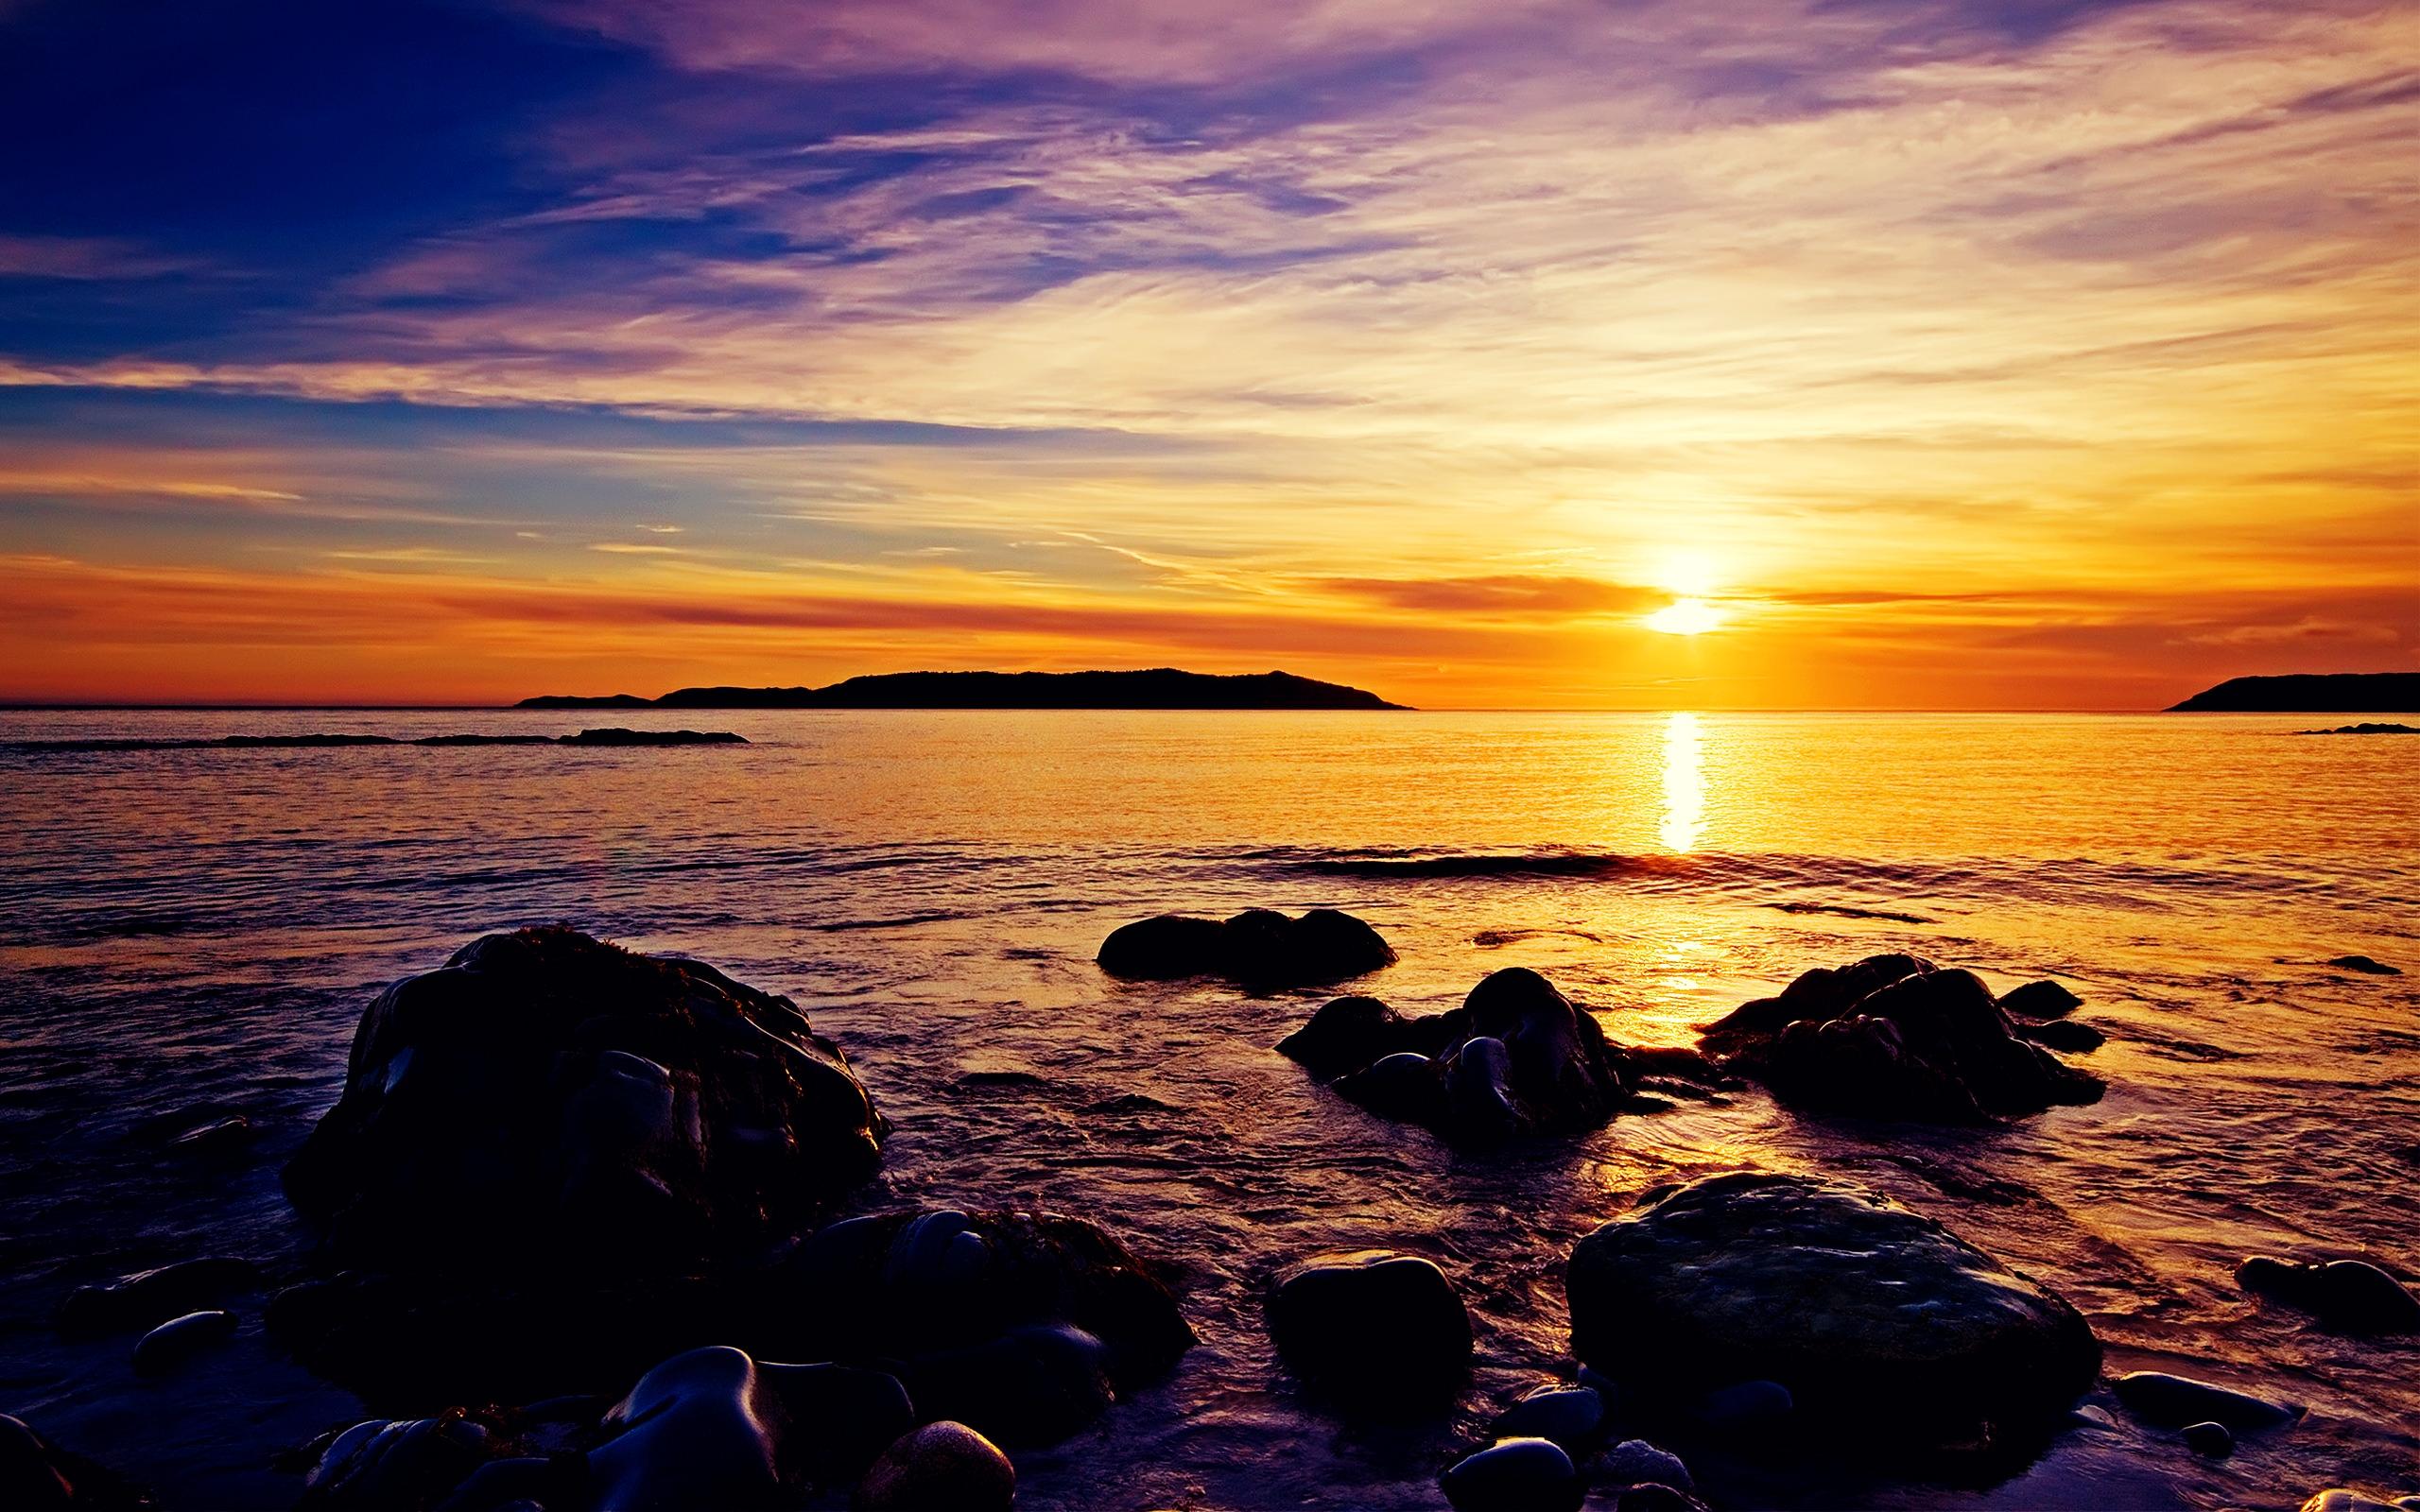 sunrise wallpaper,sky,body of water,horizon,sea,sunset